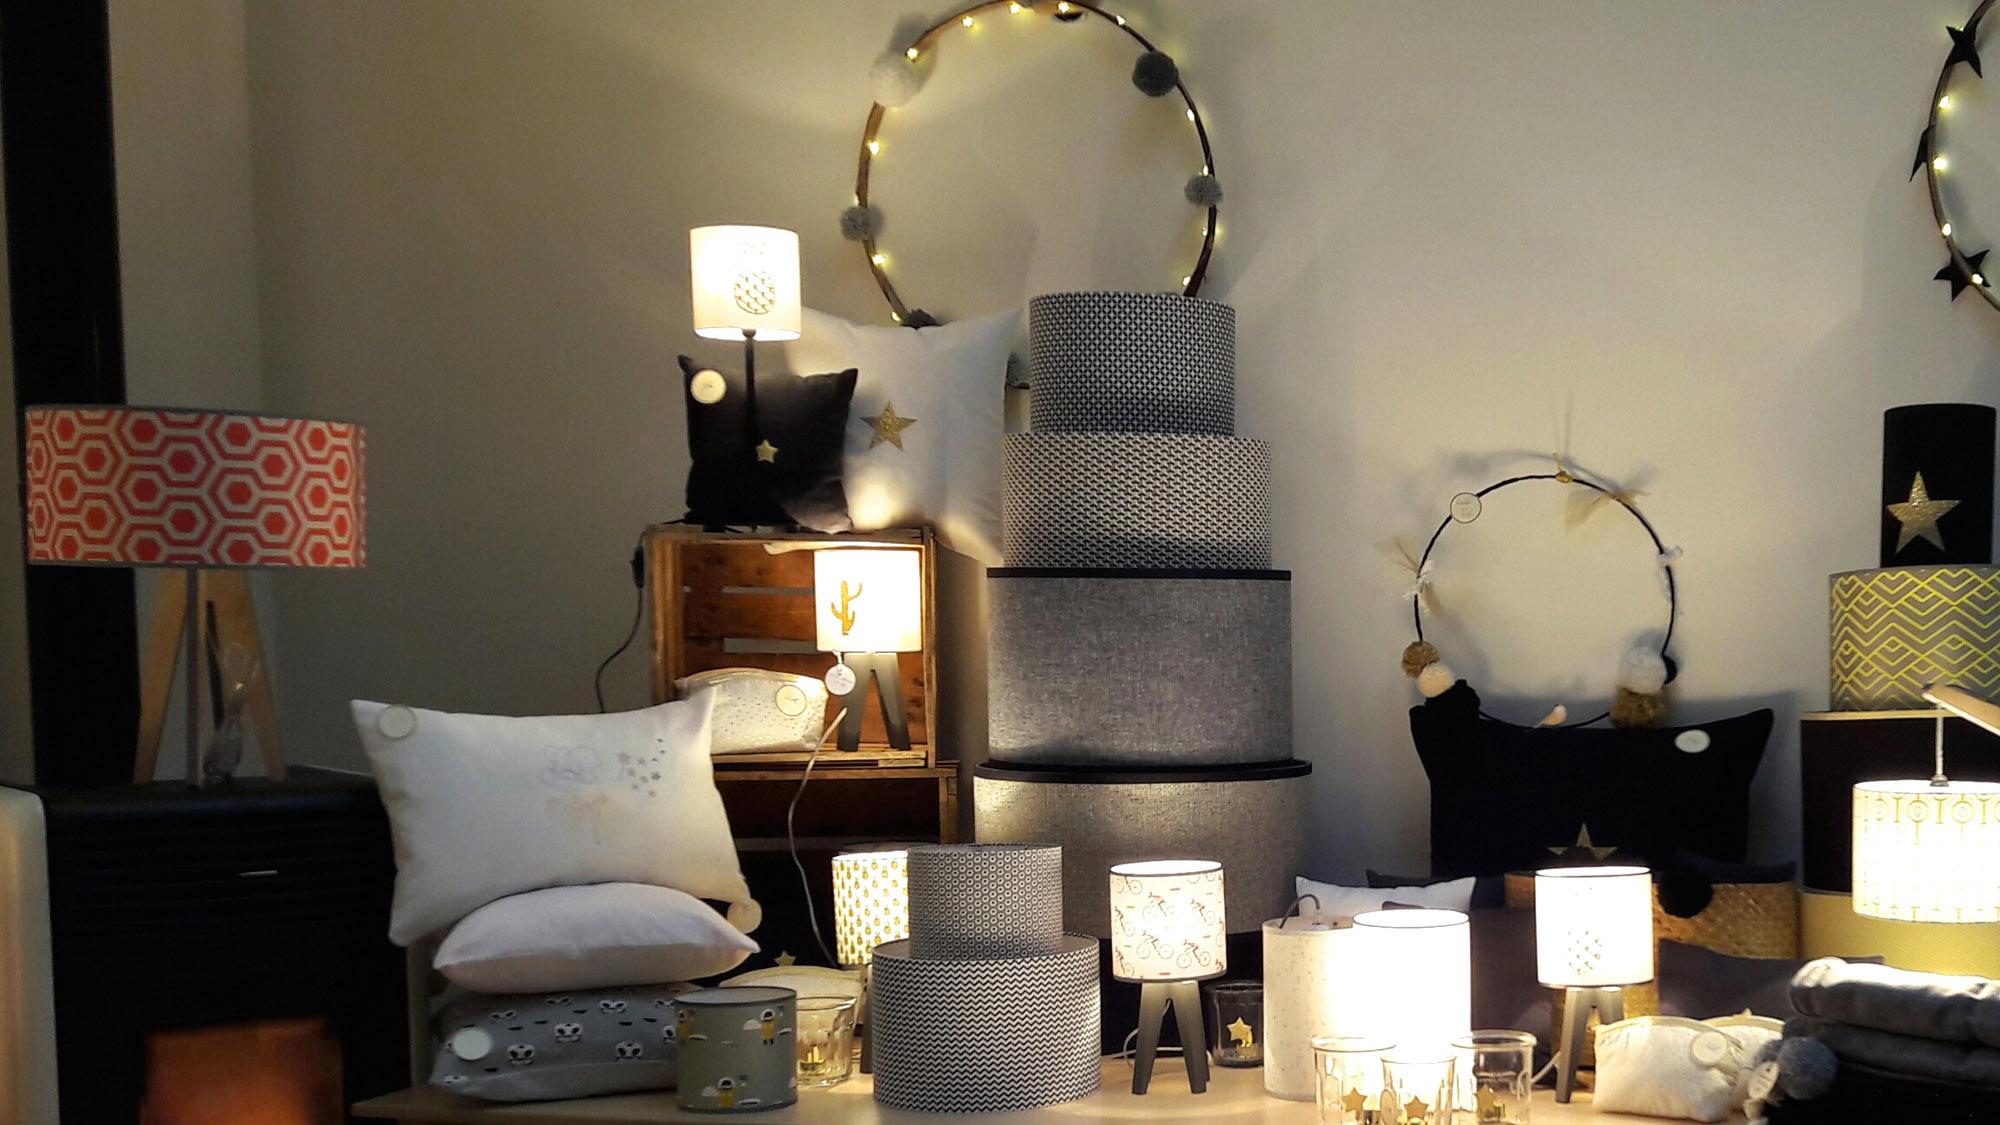 abat jour lyon alexandra d 39 argentr cr ations. Black Bedroom Furniture Sets. Home Design Ideas